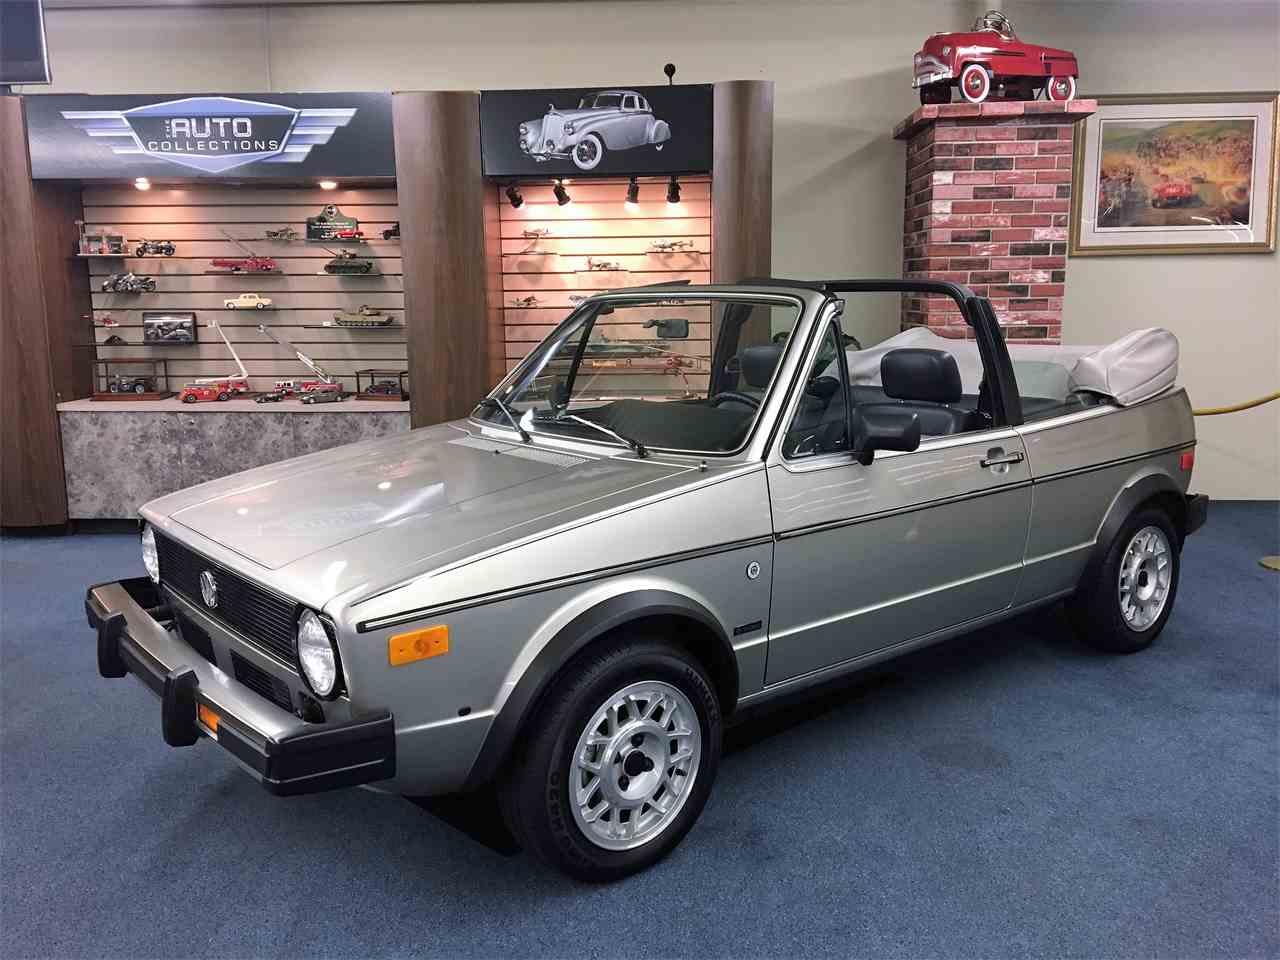 1985 Volkswagen Cabriolet For Sale Classiccars Com Cc 930047